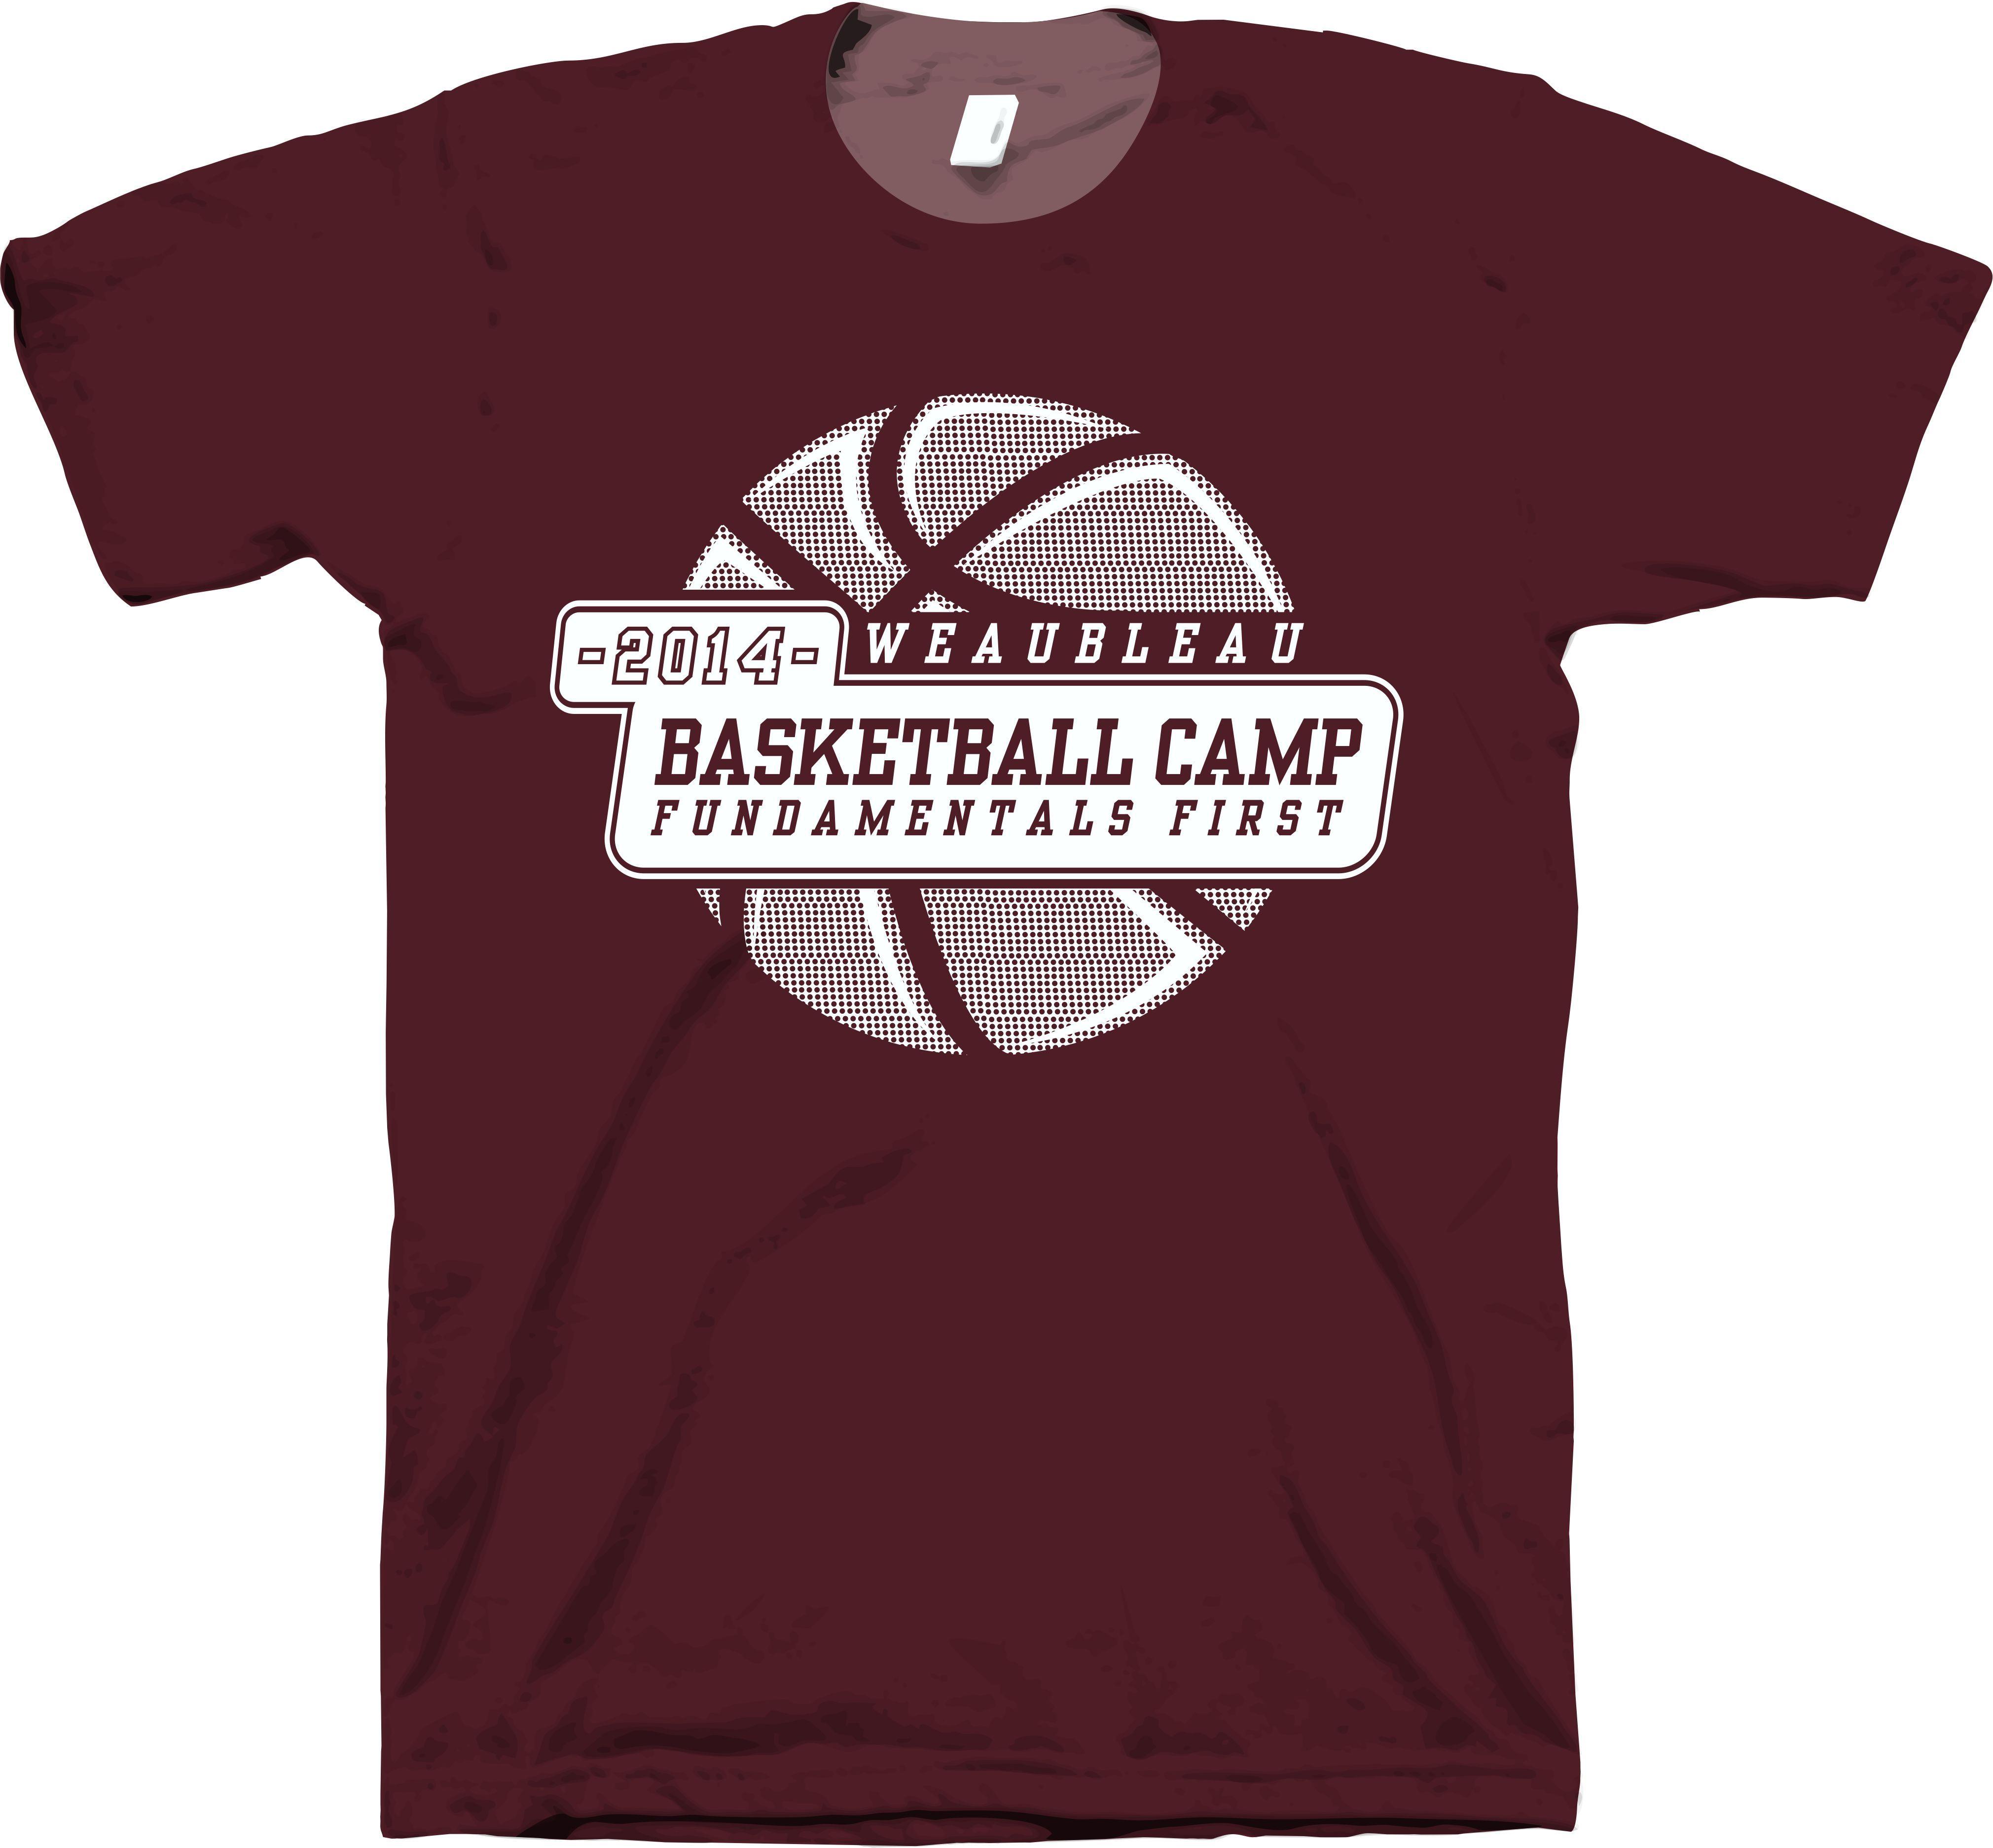 Design t shirt soccer - Basketball Camp Design Basketball Campssoccerspirit Wearshirt Designst Shirt